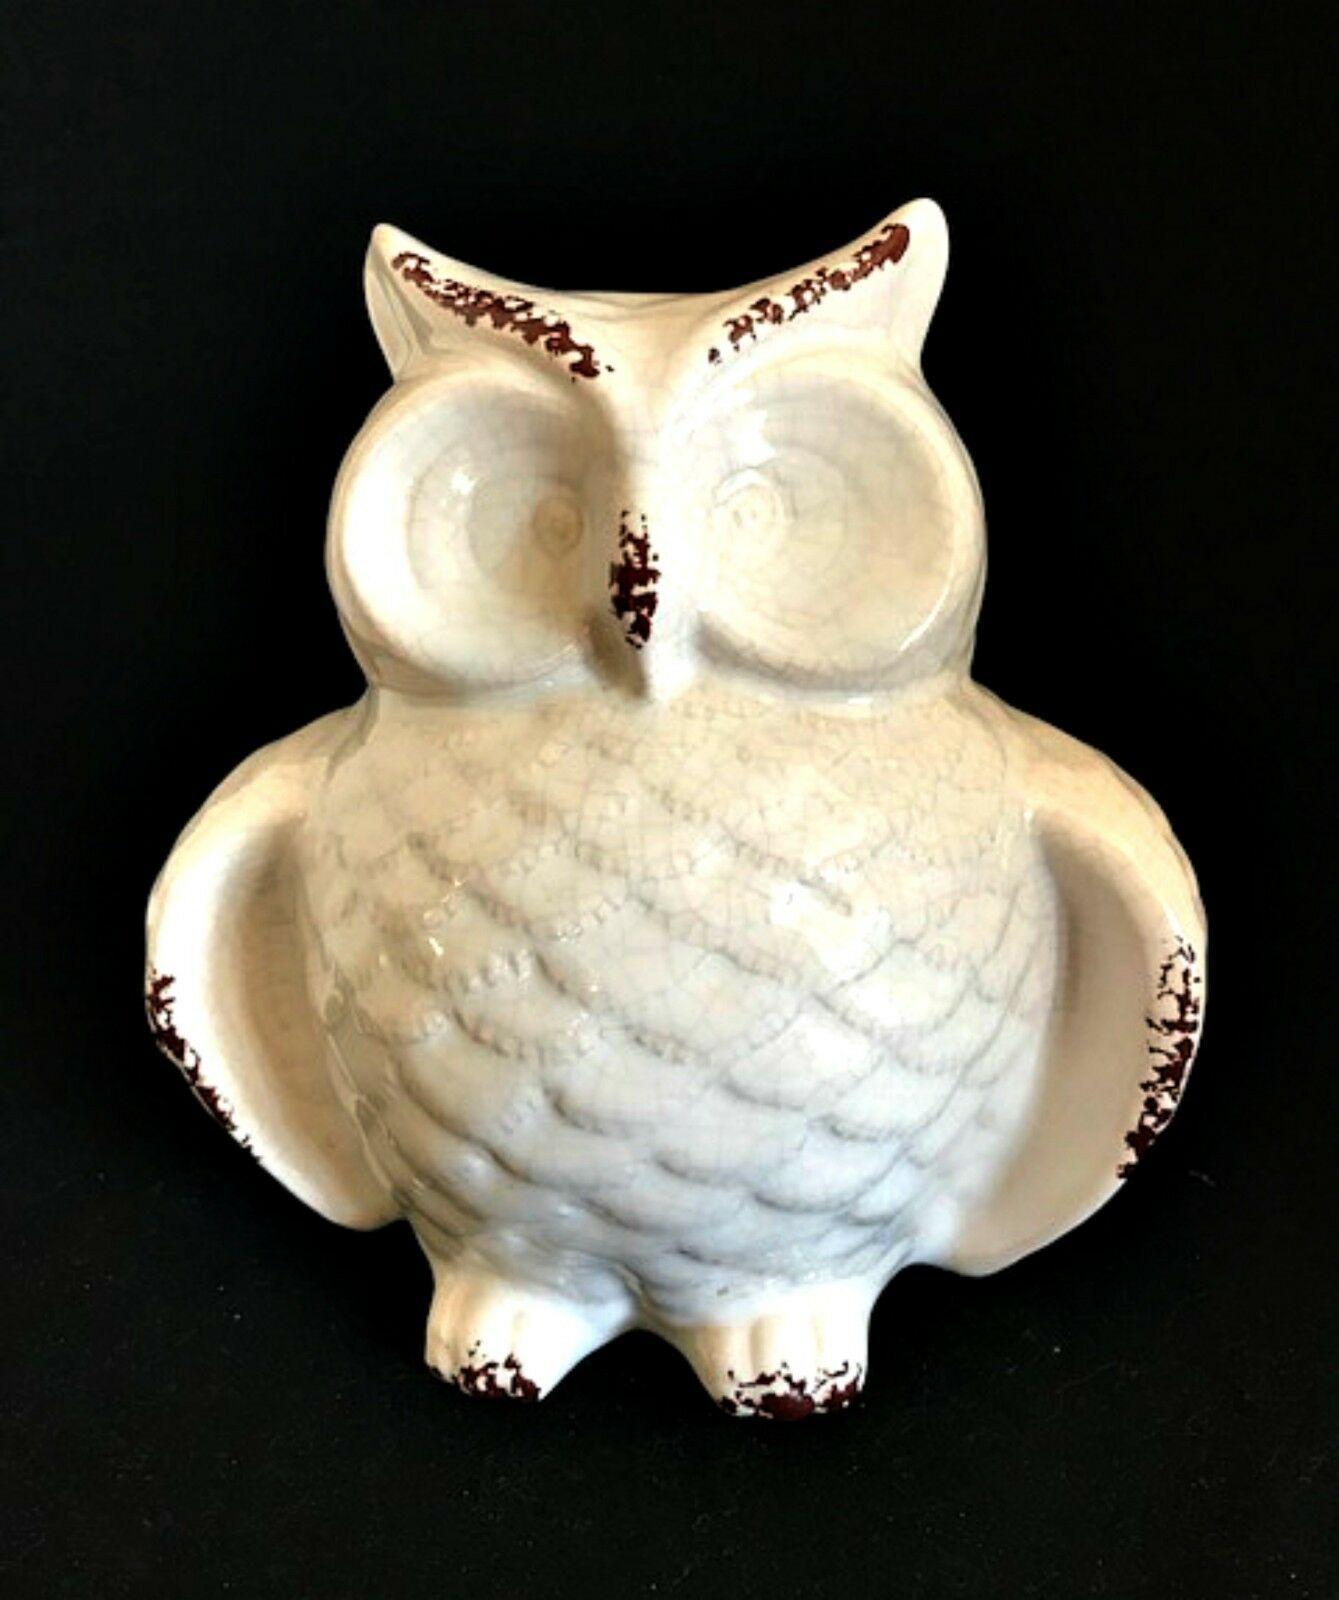 Ceramic Owl Figurine Shabby Glazed Paint White Brown Home Decor 6.5 in Tall New